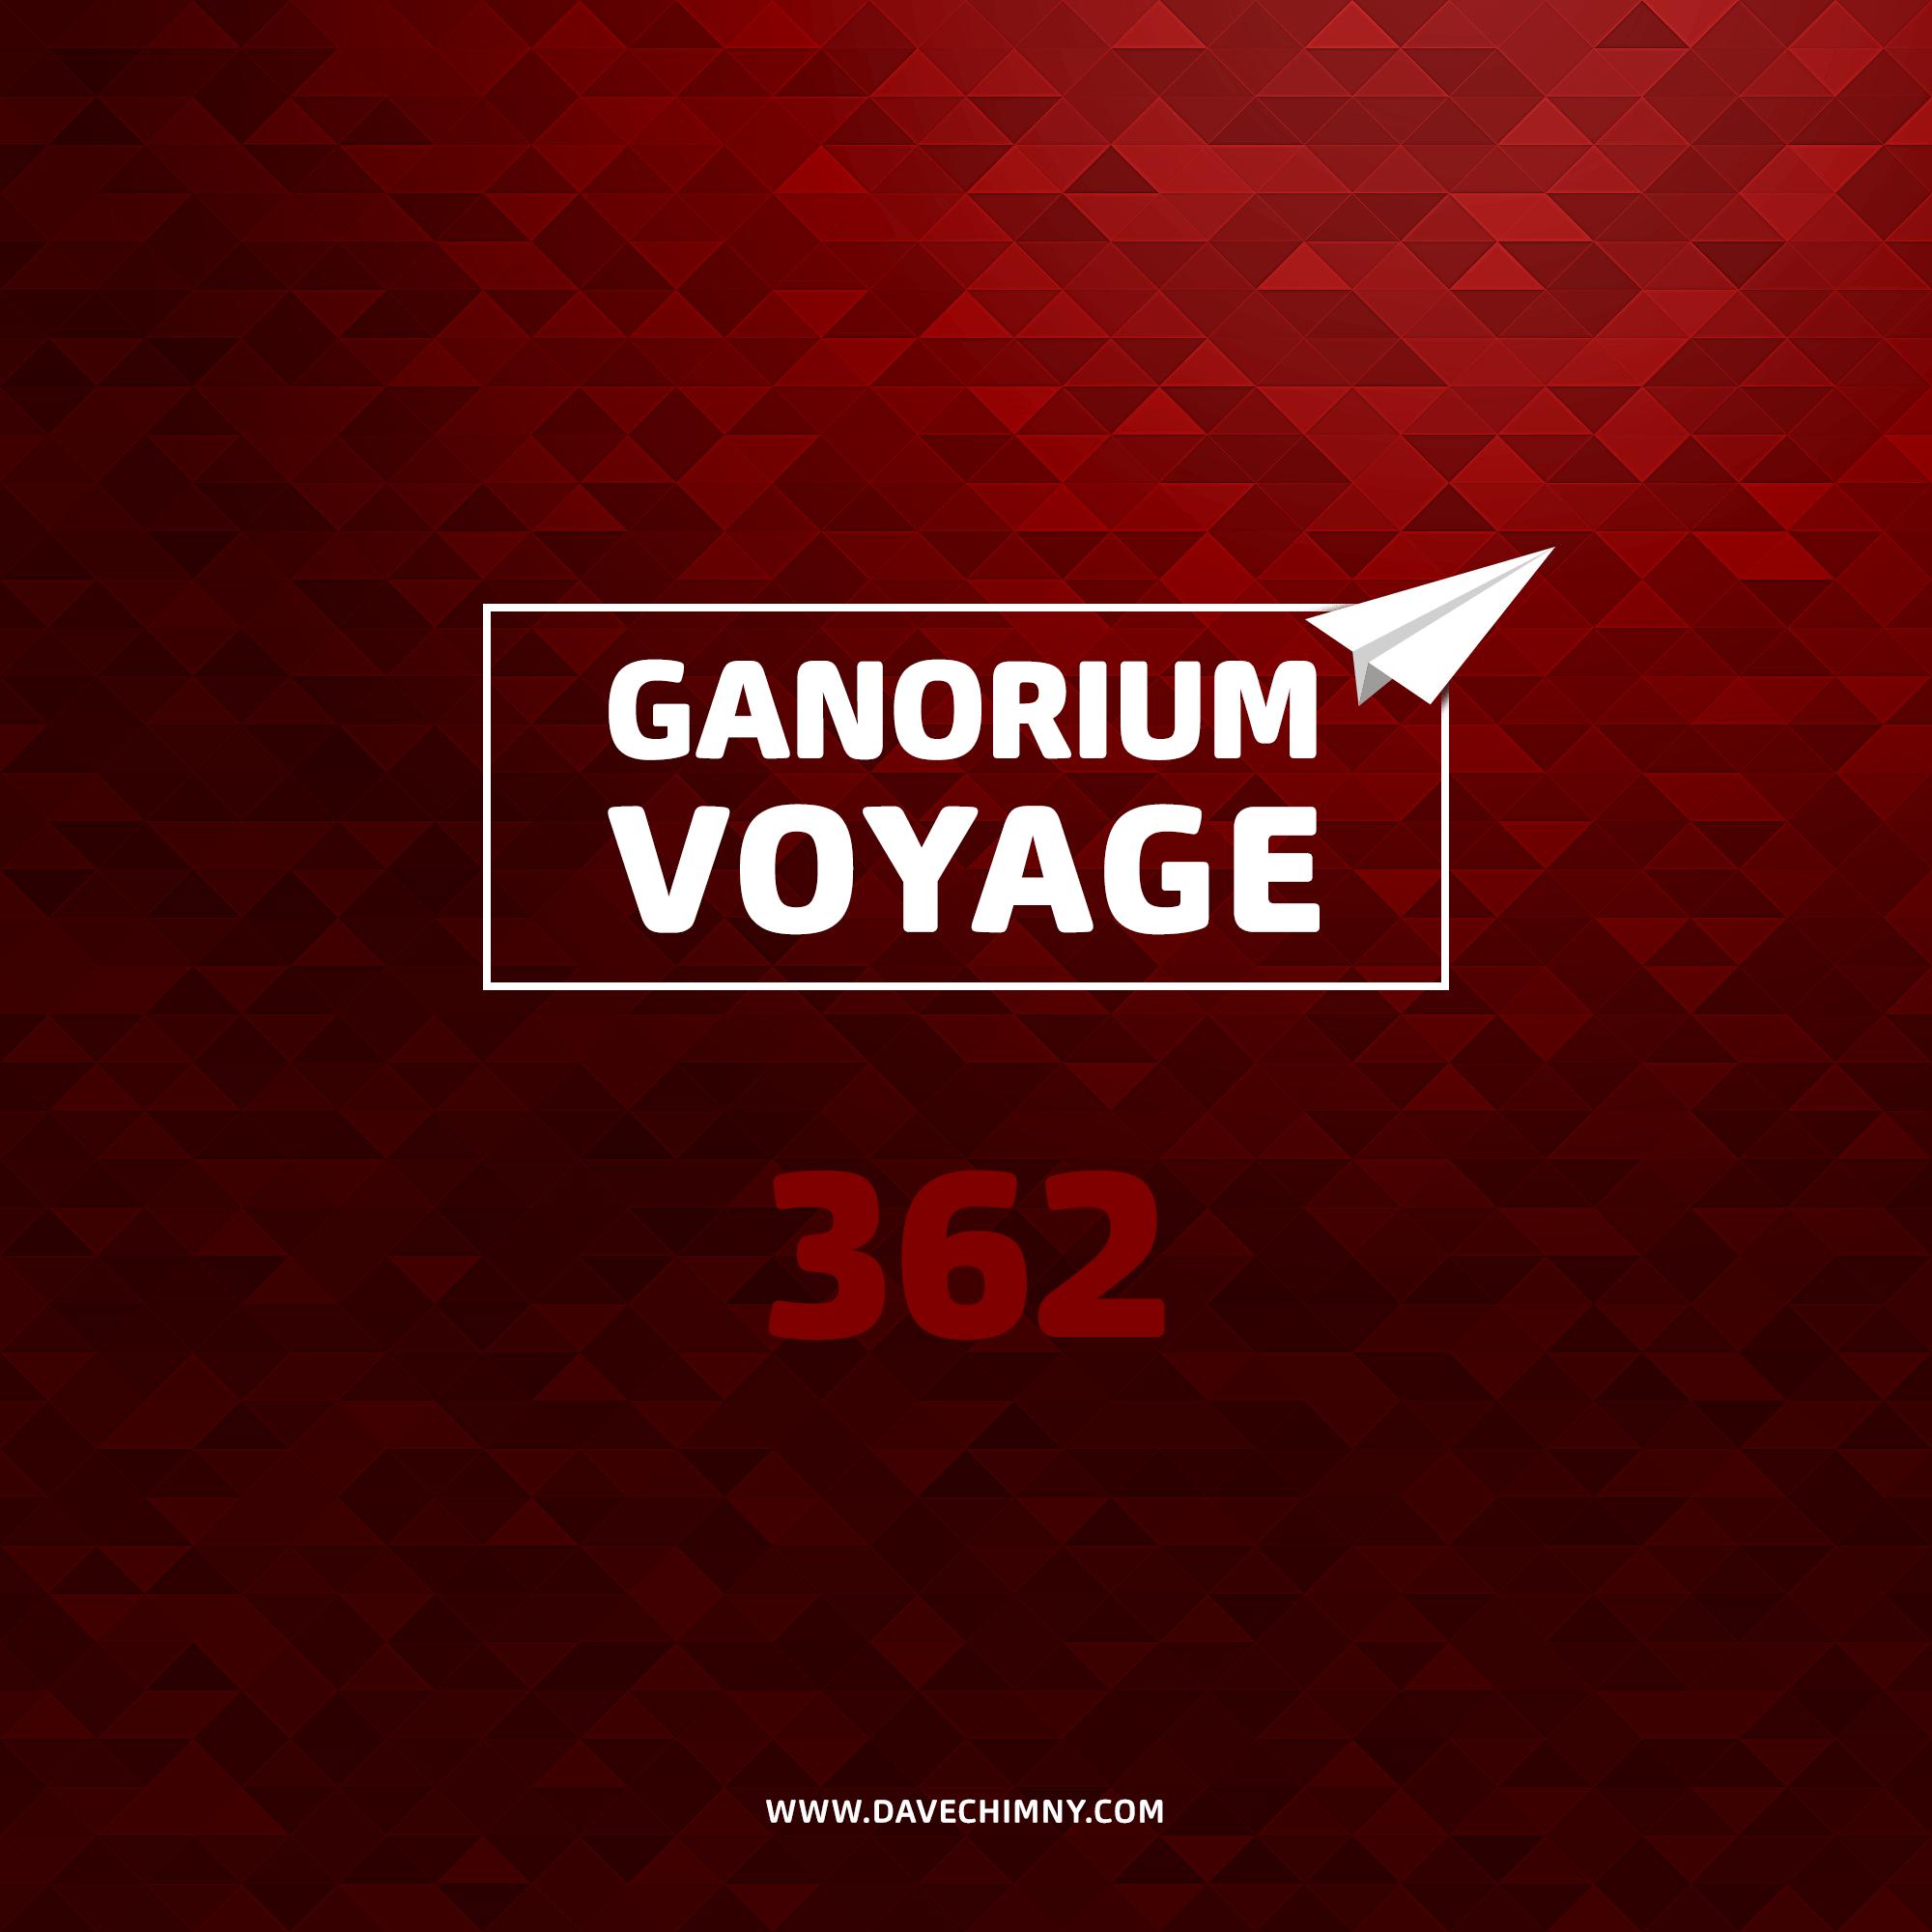 Dave Chimny – Ganorium Voyage 362